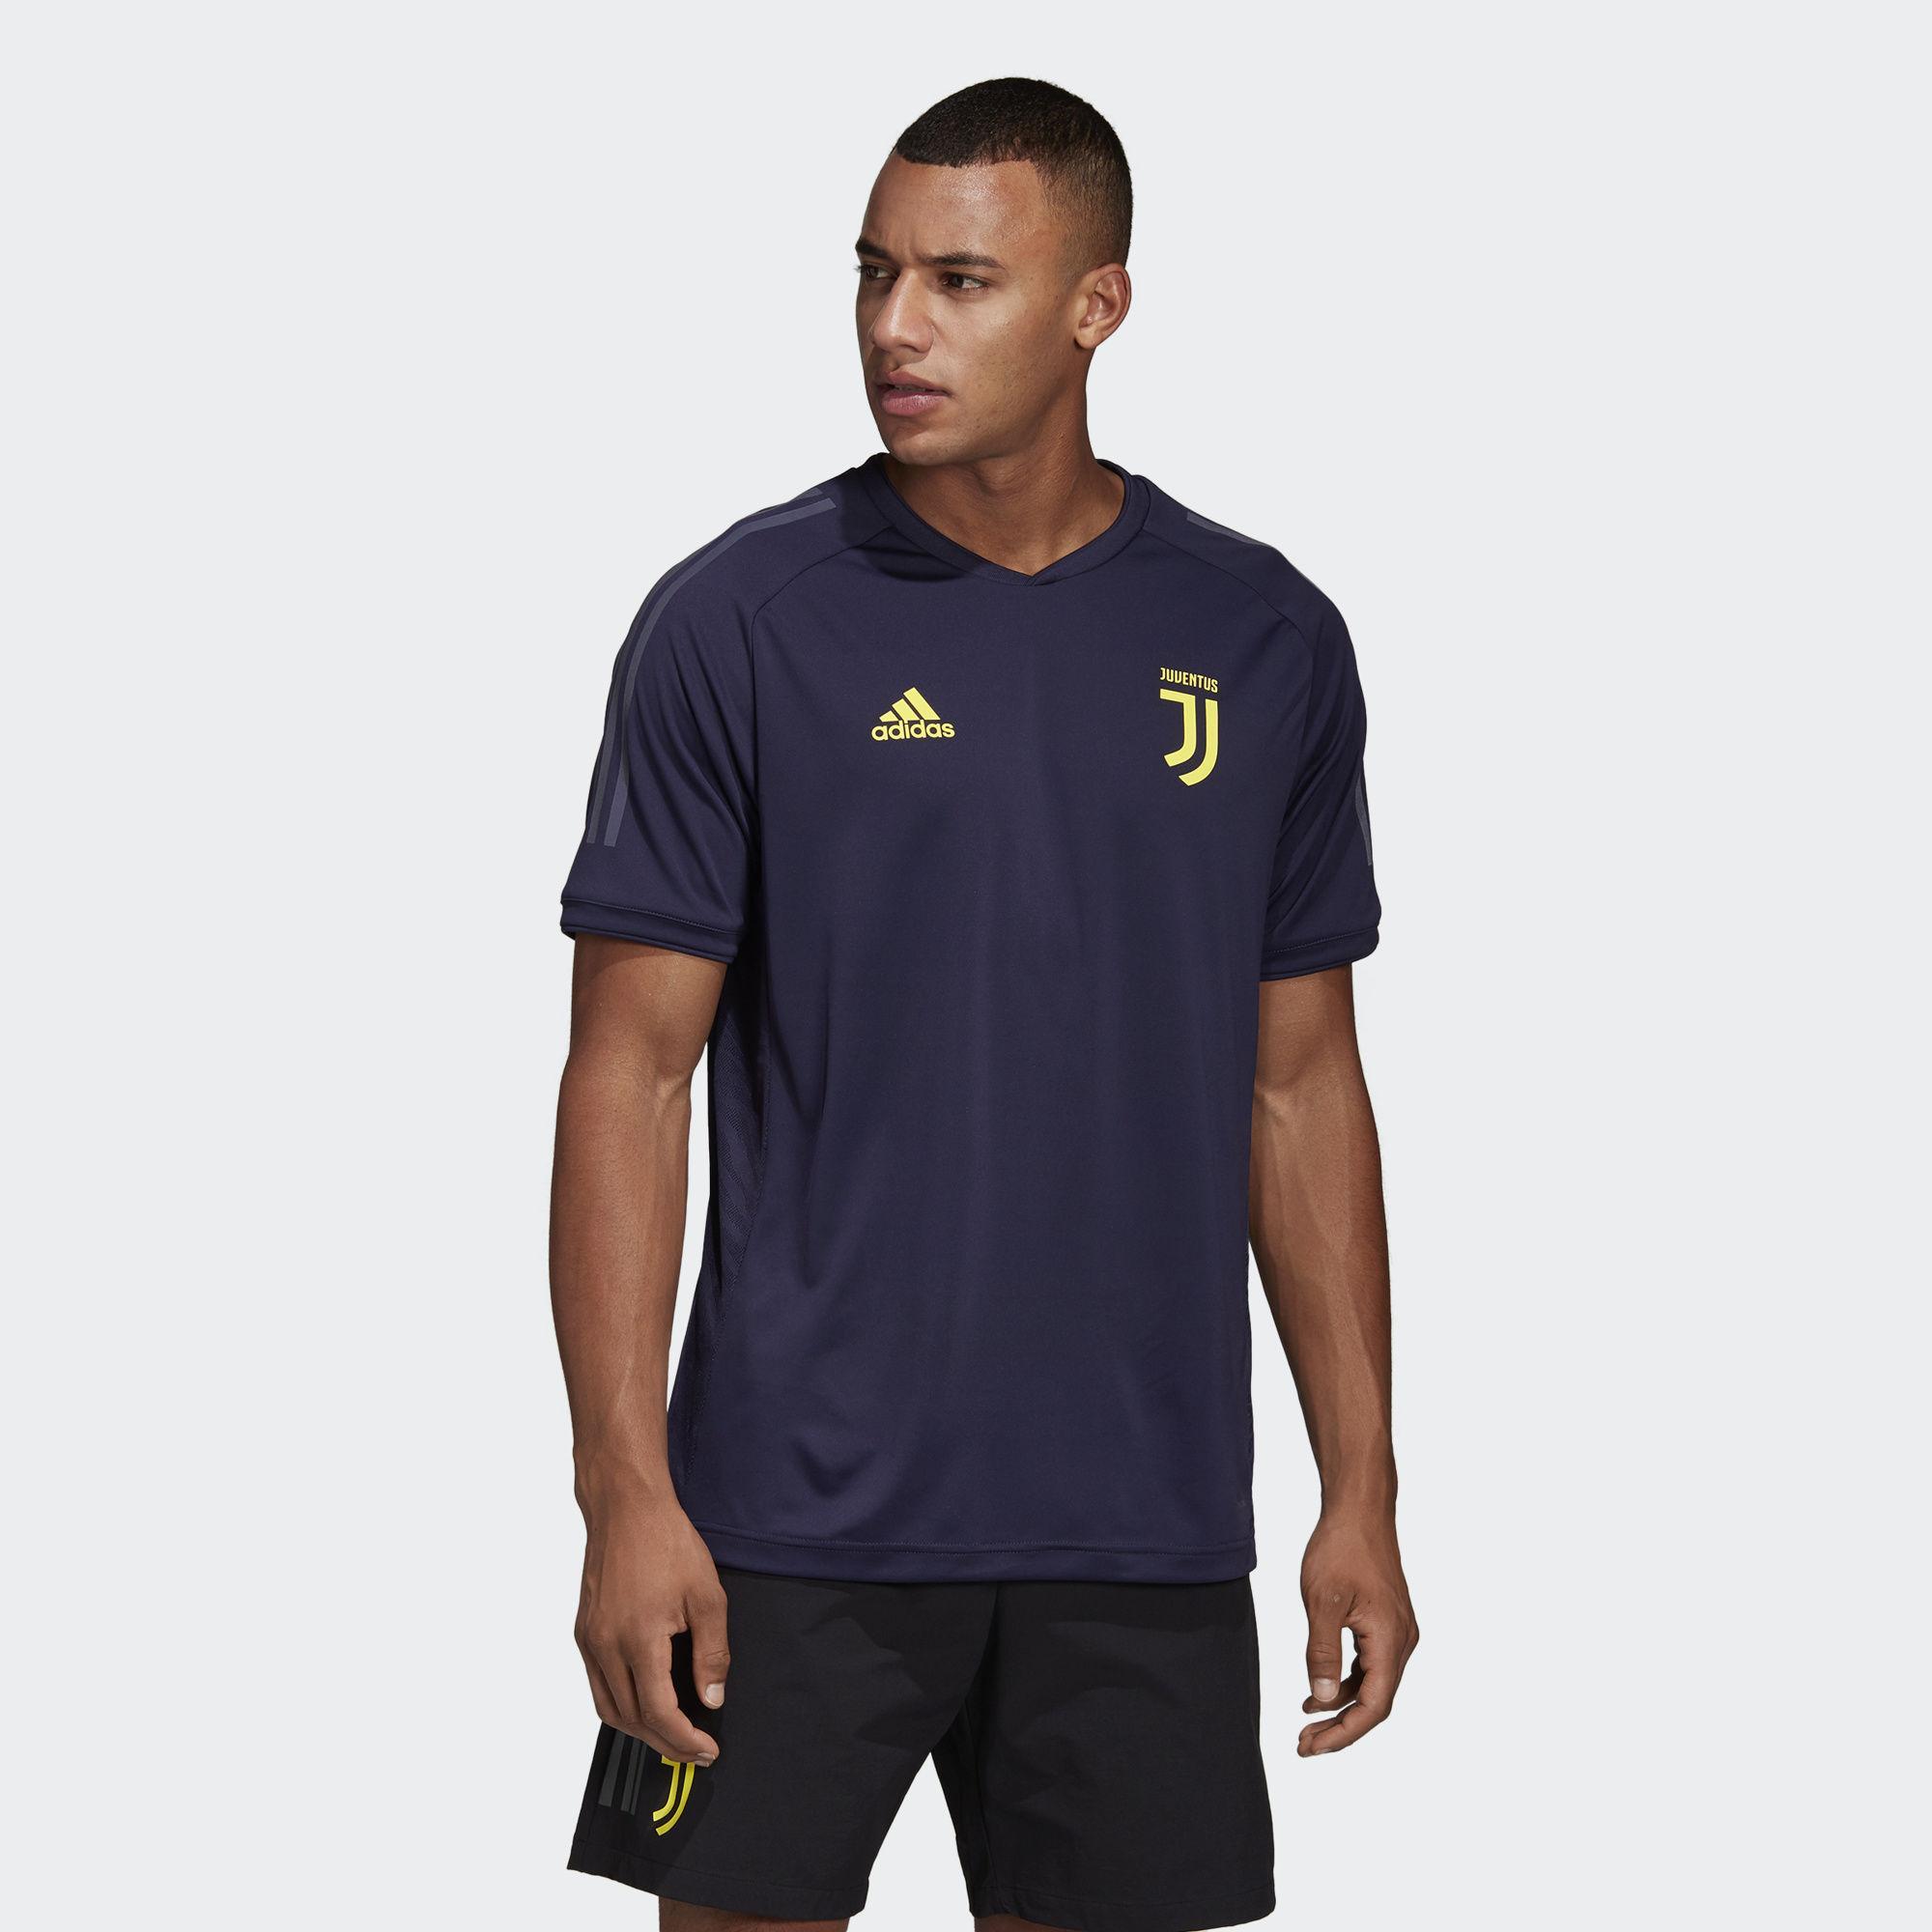 d6f578777b1 Adidas - Blue Juventus Ultimate Training Jersey for Men - Lyst. View  fullscreen